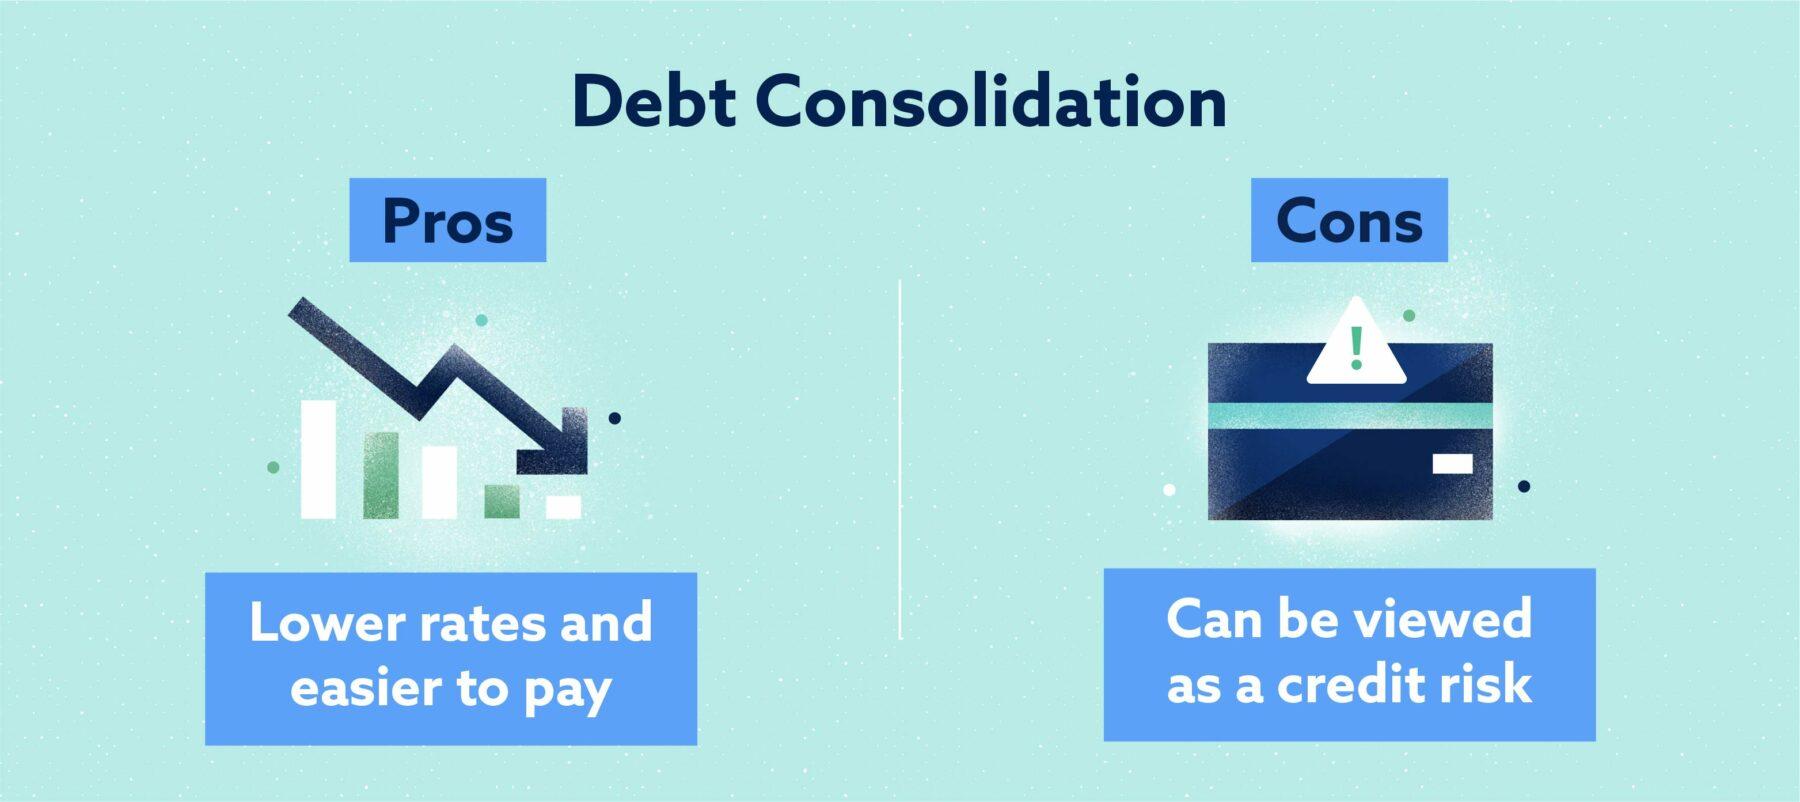 Debt Consolidation Image